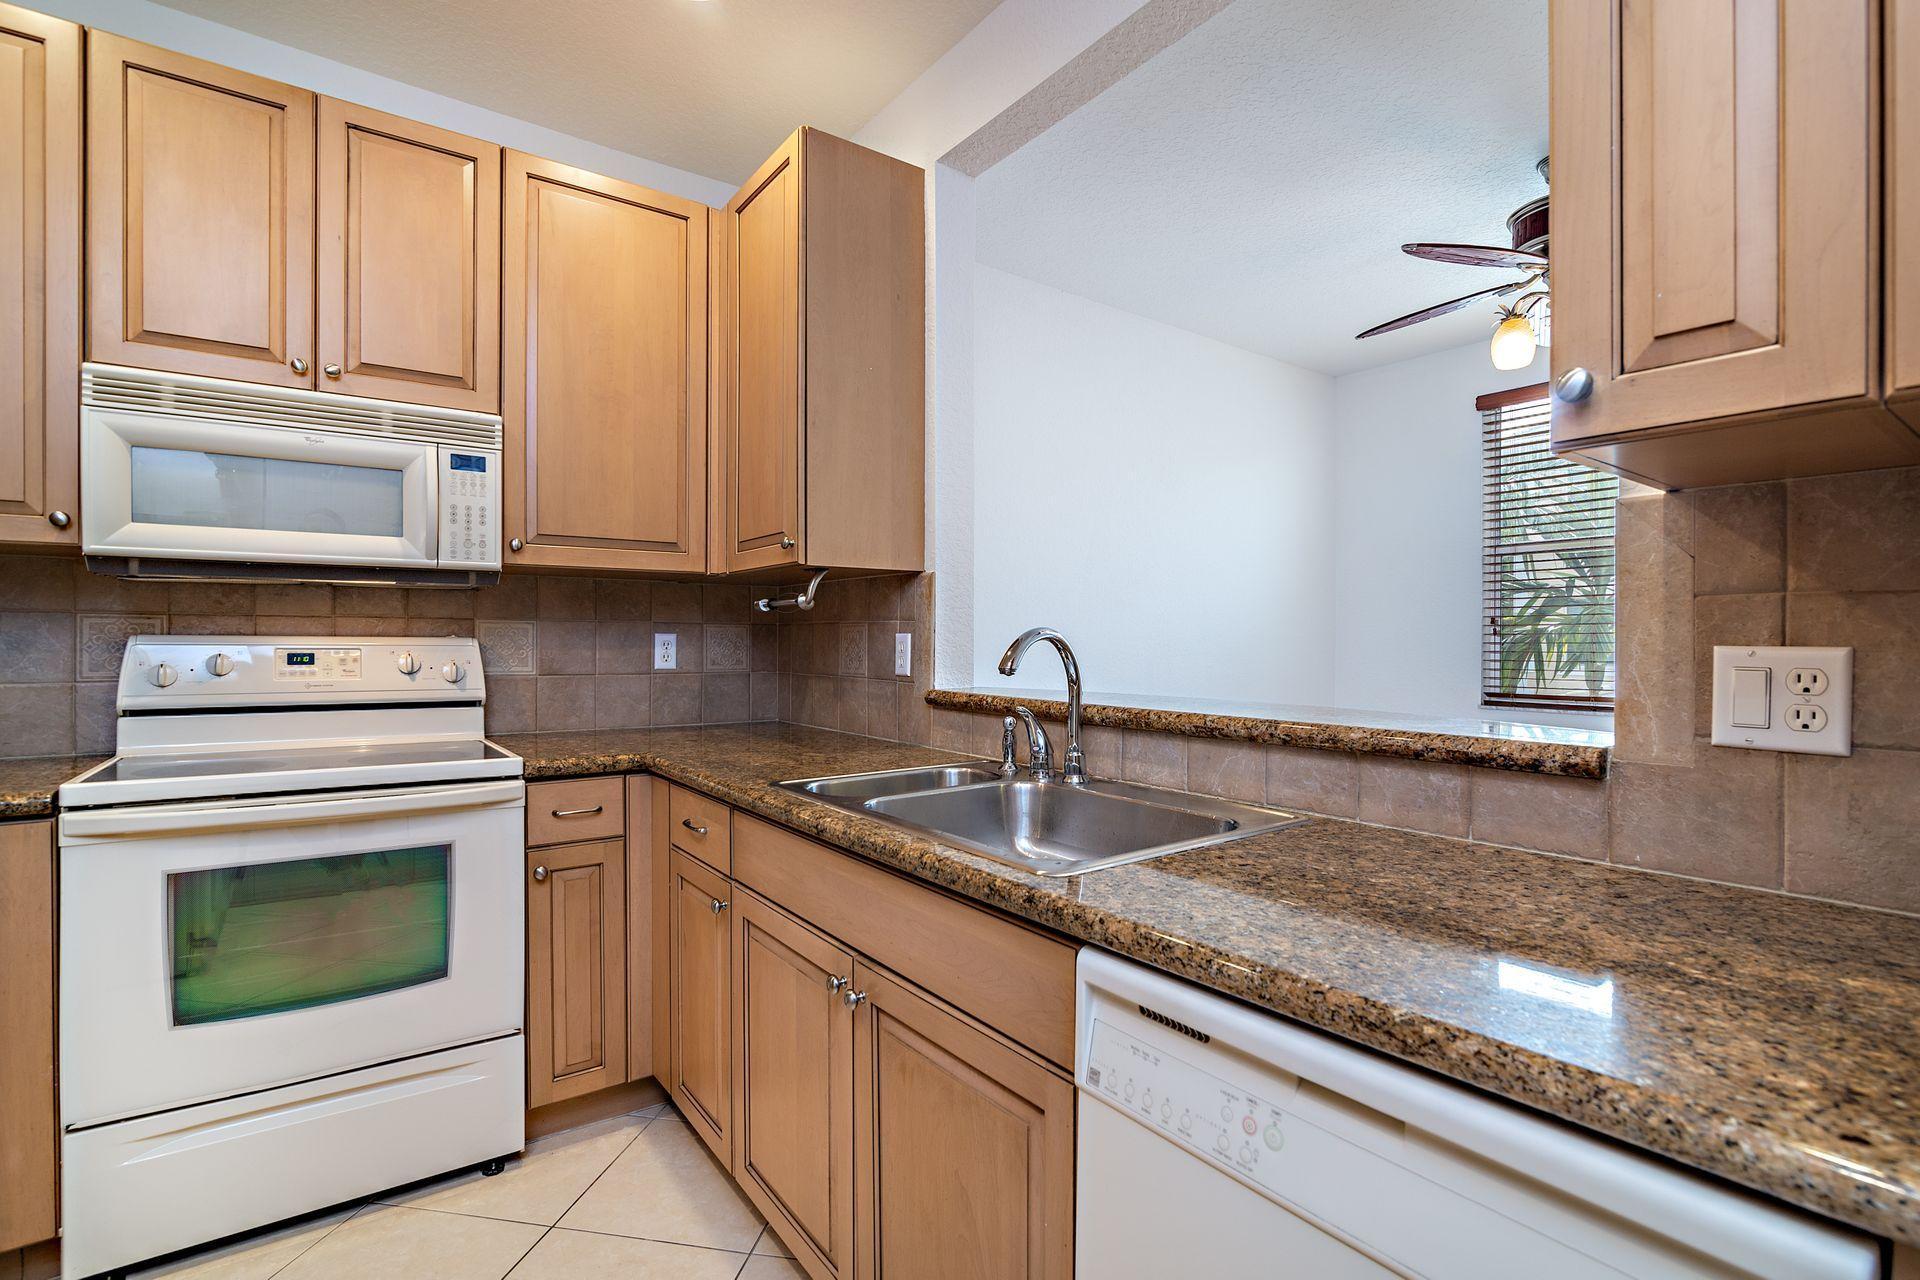 4122 Greenway Drive, Jupiter, Florida 33458, 3 Bedrooms Bedrooms, ,3.1 BathroomsBathrooms,F,Townhouse,Greenway,RX-10496104